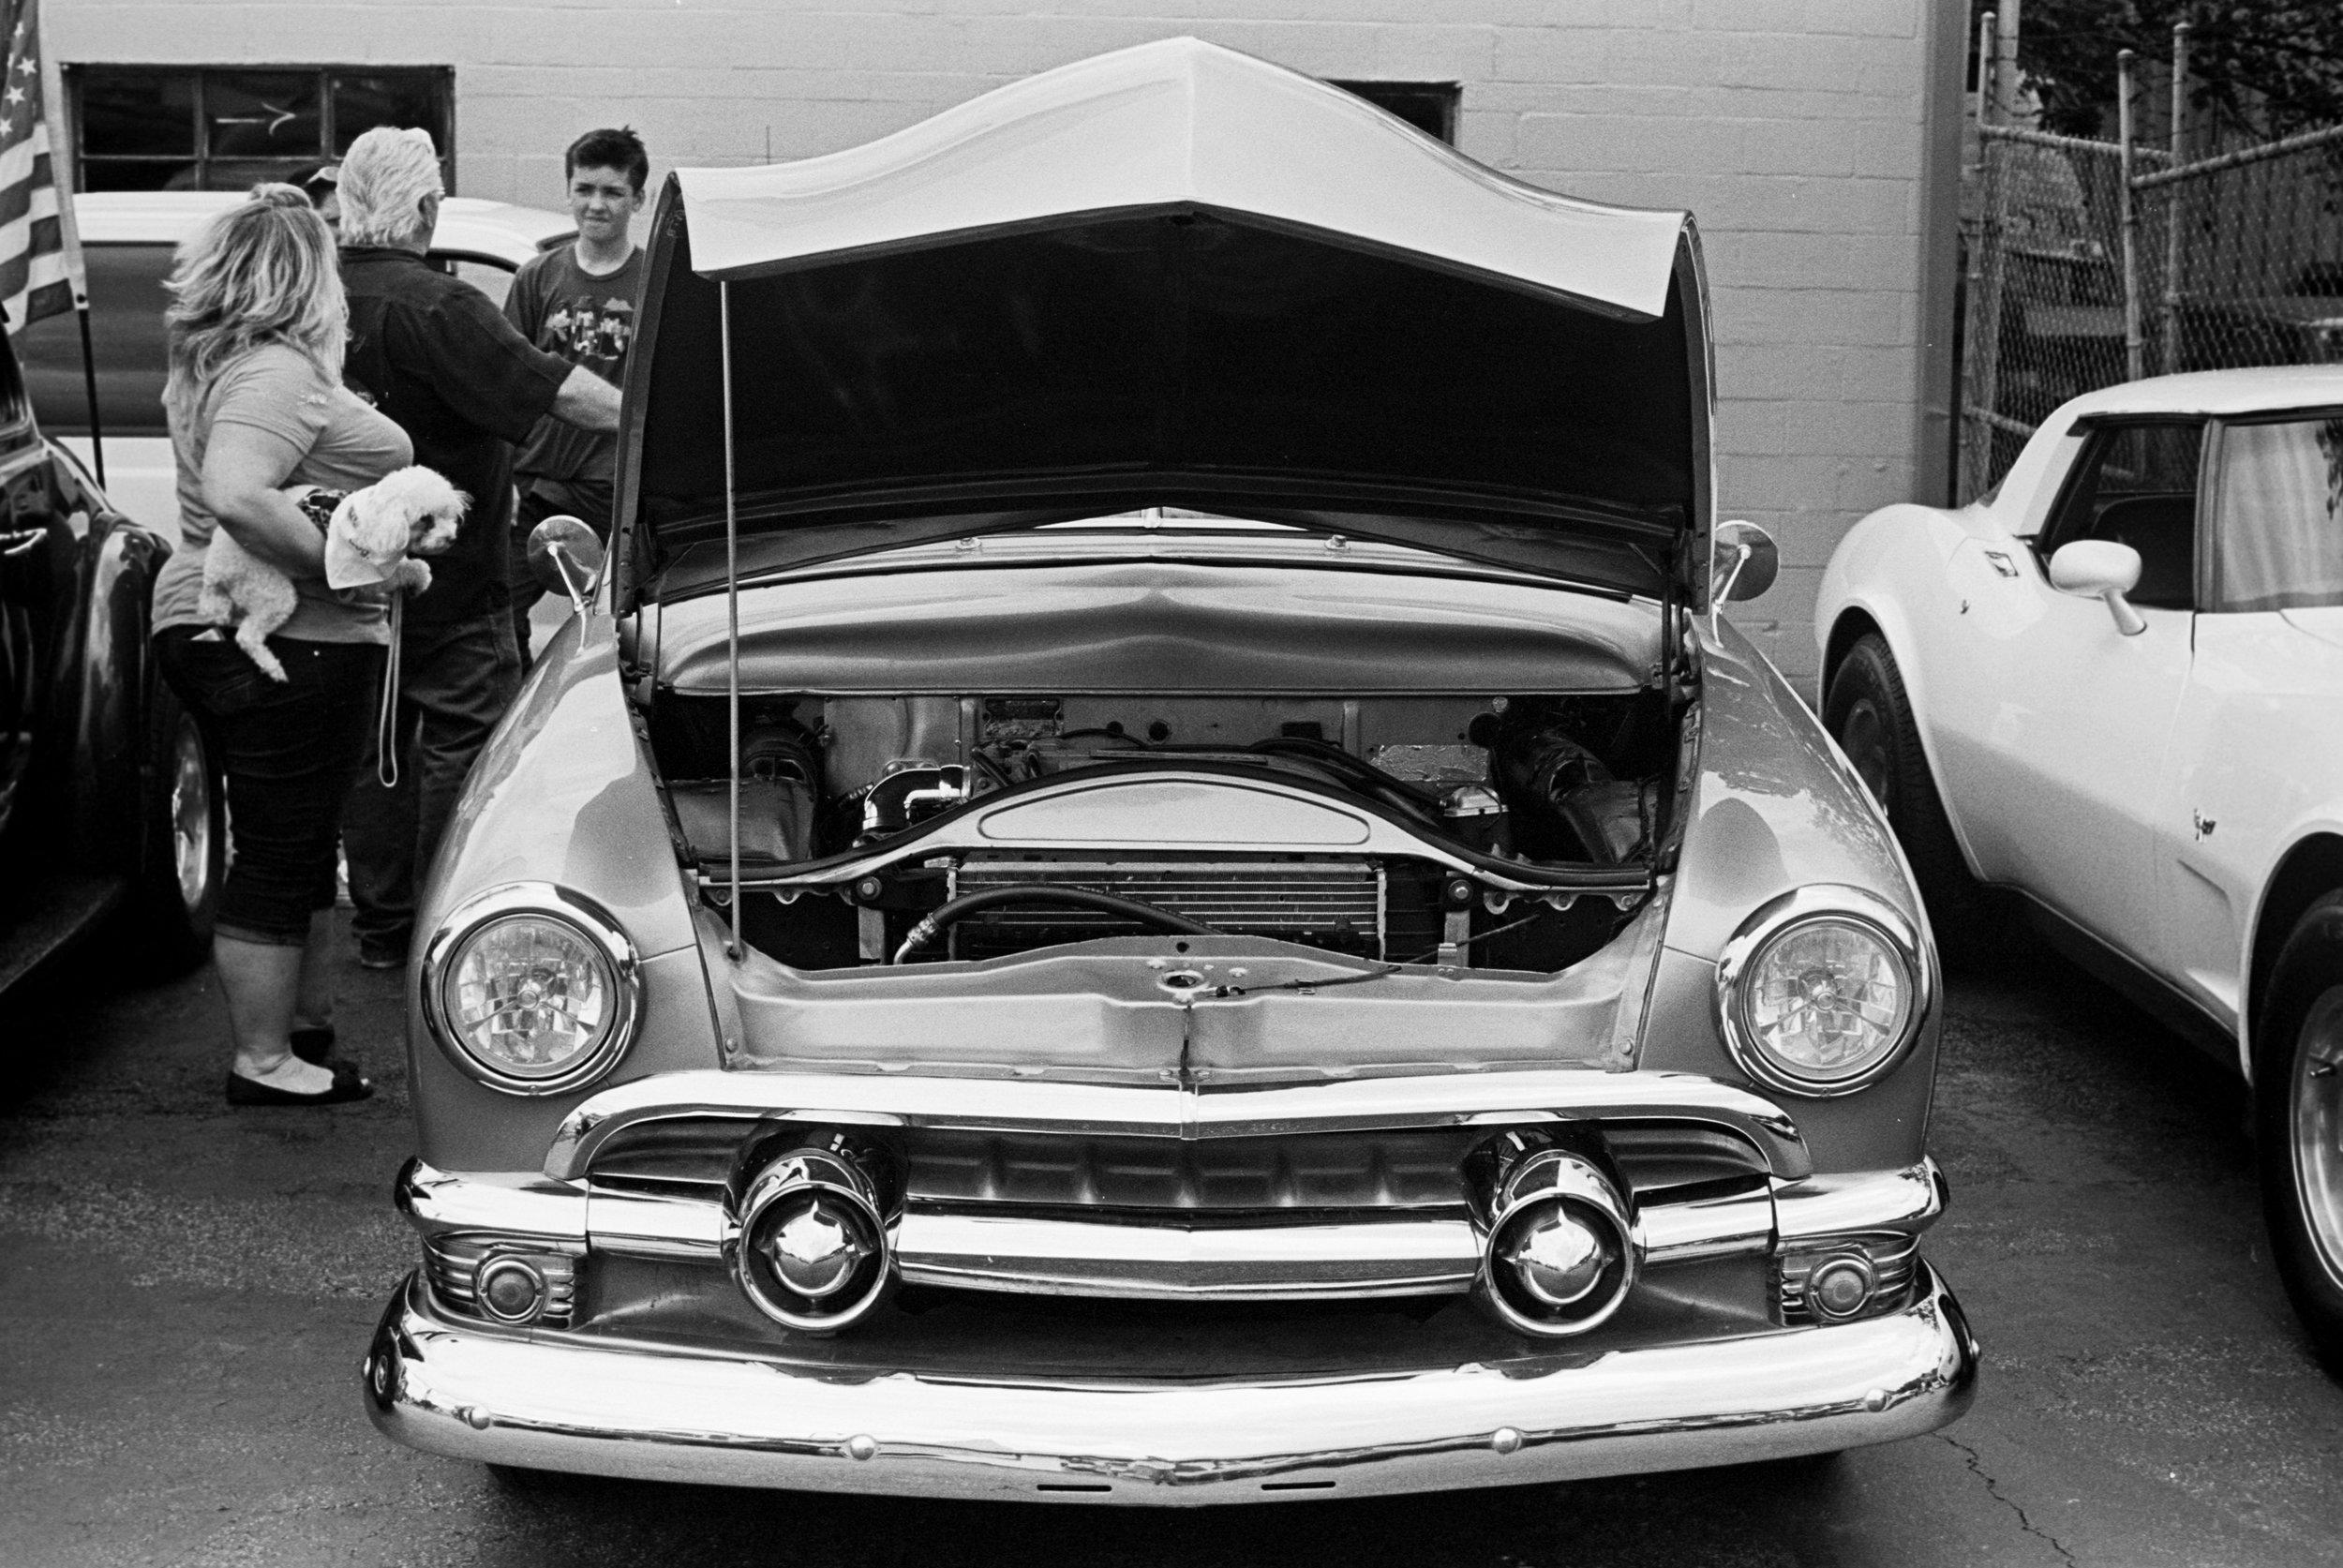 car-show-little-longhorn-saloon-2015-009.jpg